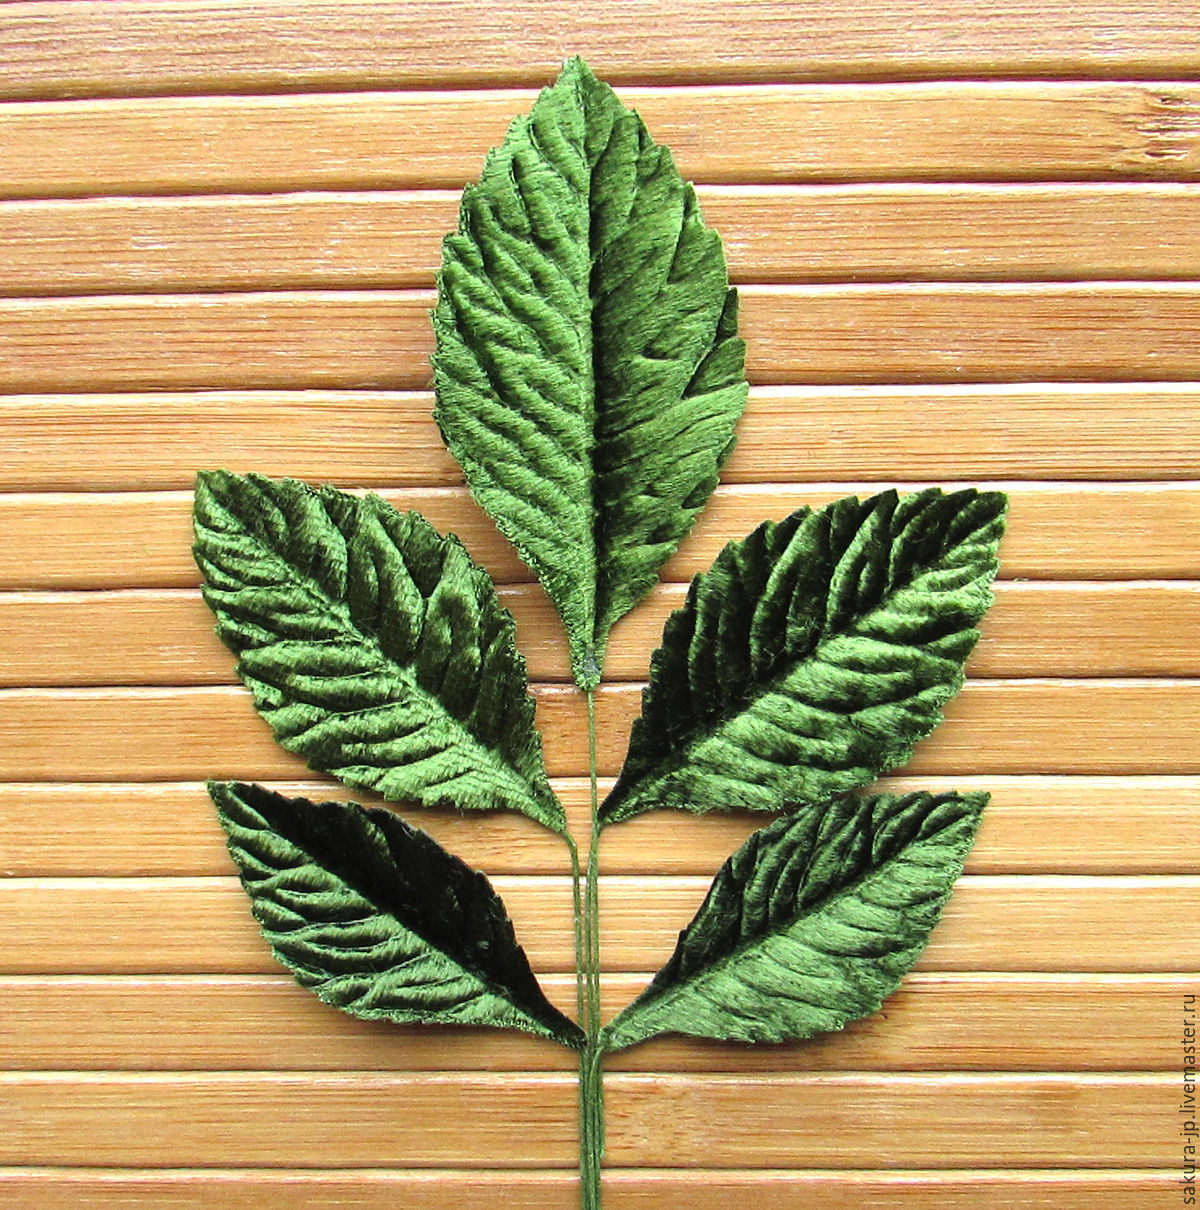 The leaves of the rose are dark green, seruling. SAKURA - materials for citadele. Fair Masters.